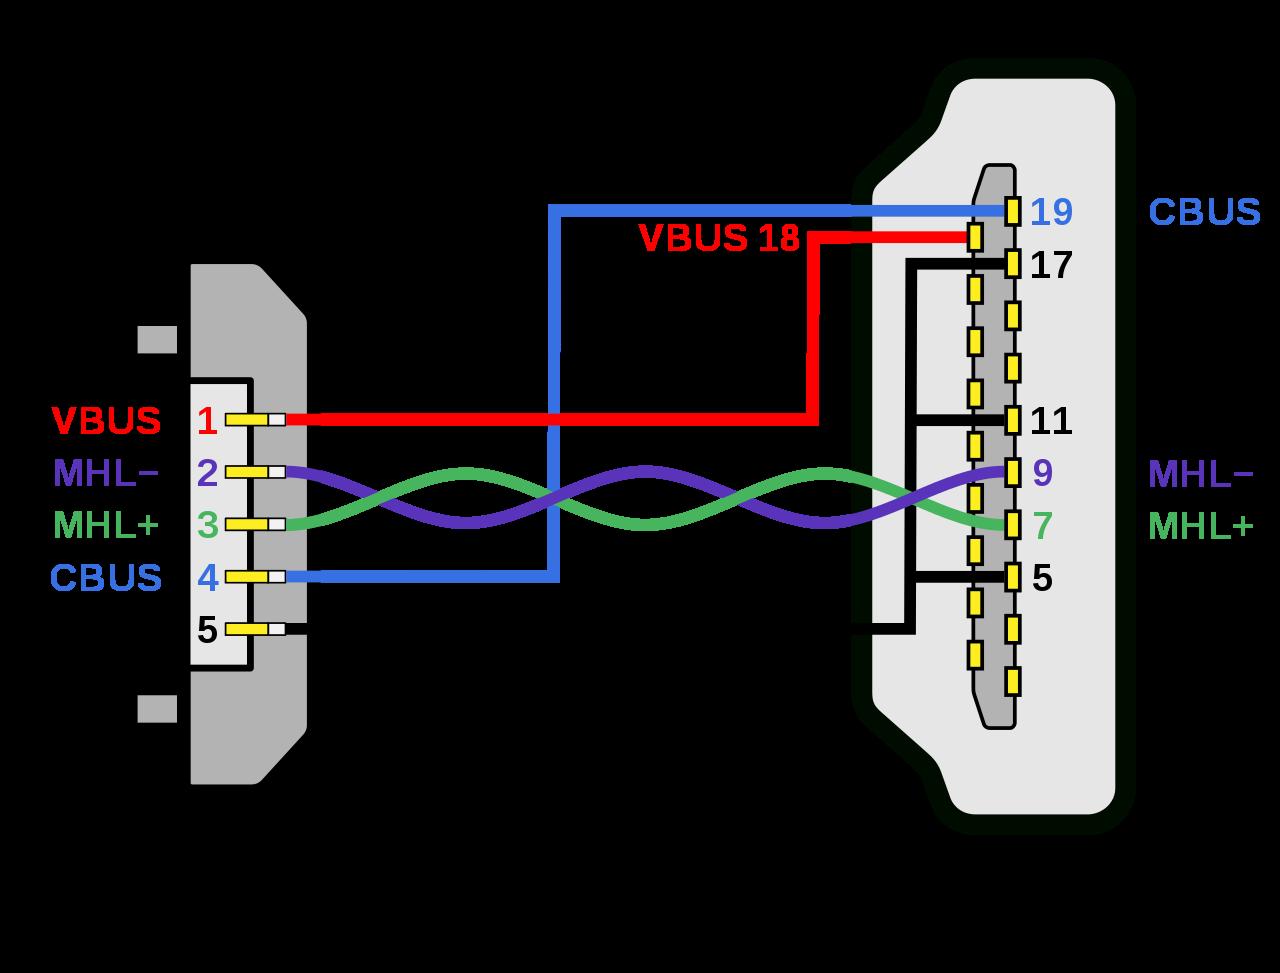 Usb To Rca Cord Splice Wiring Diagram Audio Usb Audio To Rca Cable Wiring Diagram on 3.5mm plug wiring diagram, usb cable schematic diagram, telephone plug wiring diagram, rca to usb pinouts, speakon connector wiring diagram, pyle radio wiring diagram, balanced audio wiring diagram, usb 2.0 cable diagram, rca connector positive and negative, speaker wiring diagram, rca to xlr wiring-diagram, rca wire, rca wiring positive negative,